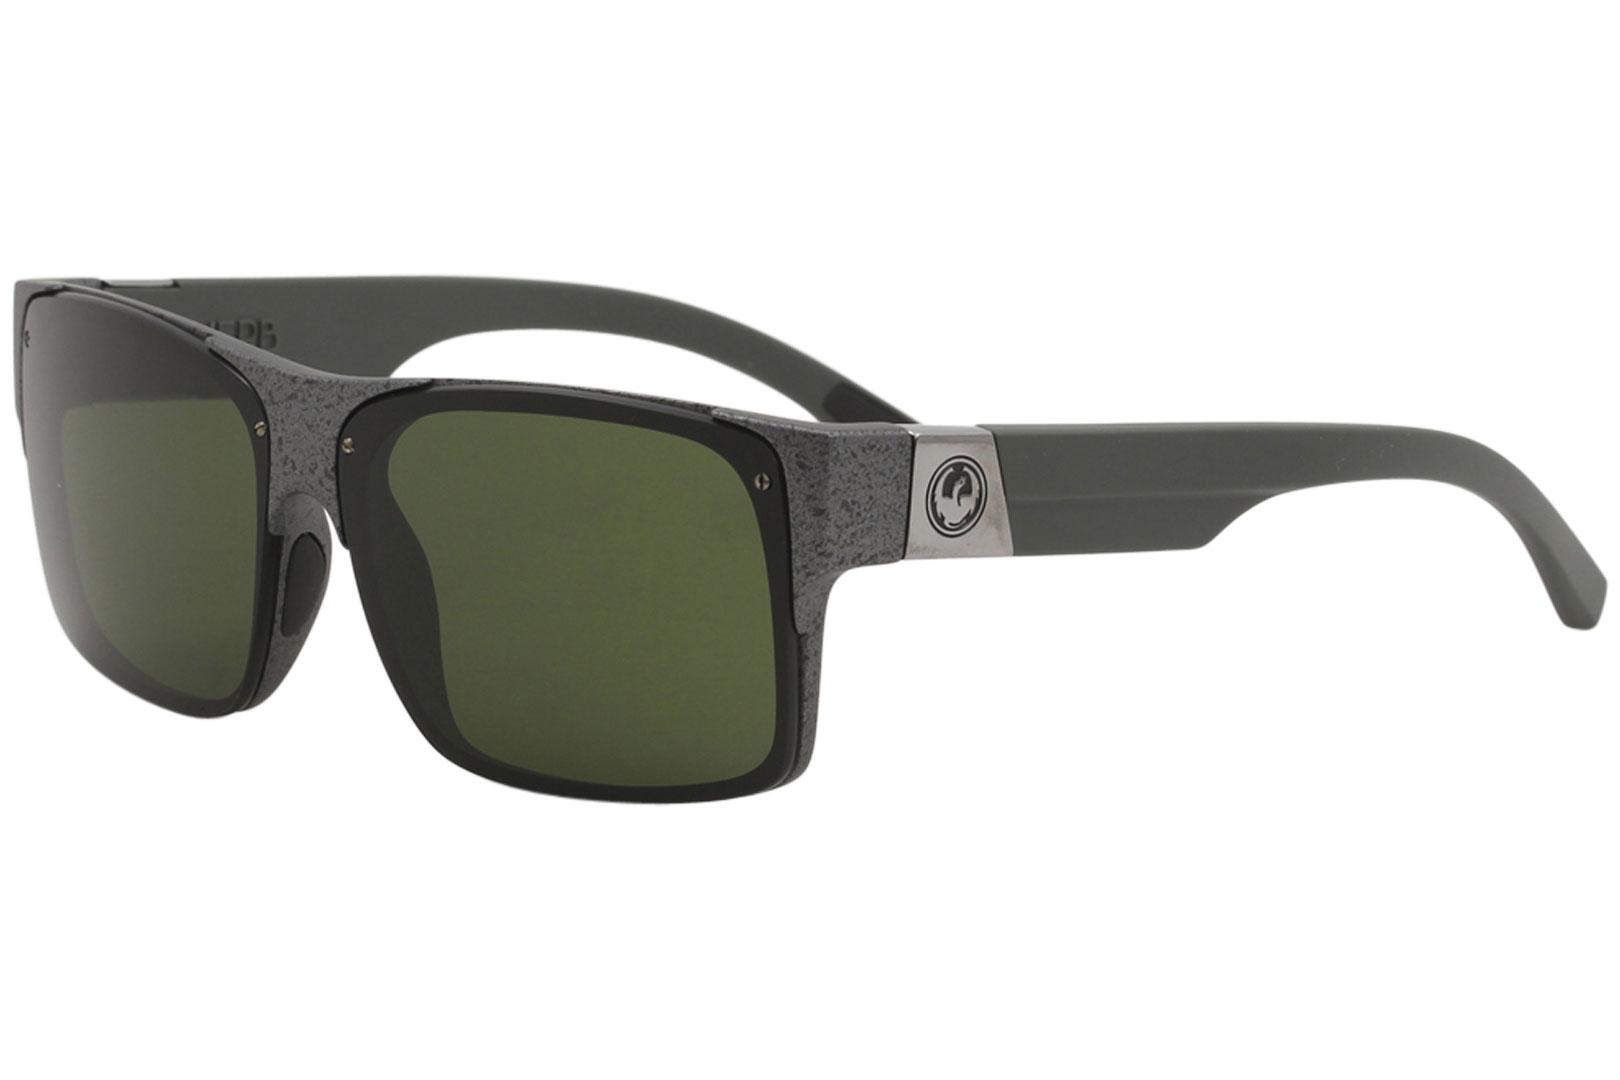 92face8db81d4 Dragon Reverb 081 Gunmetal Marble Sport Square Sunglasses 62mm